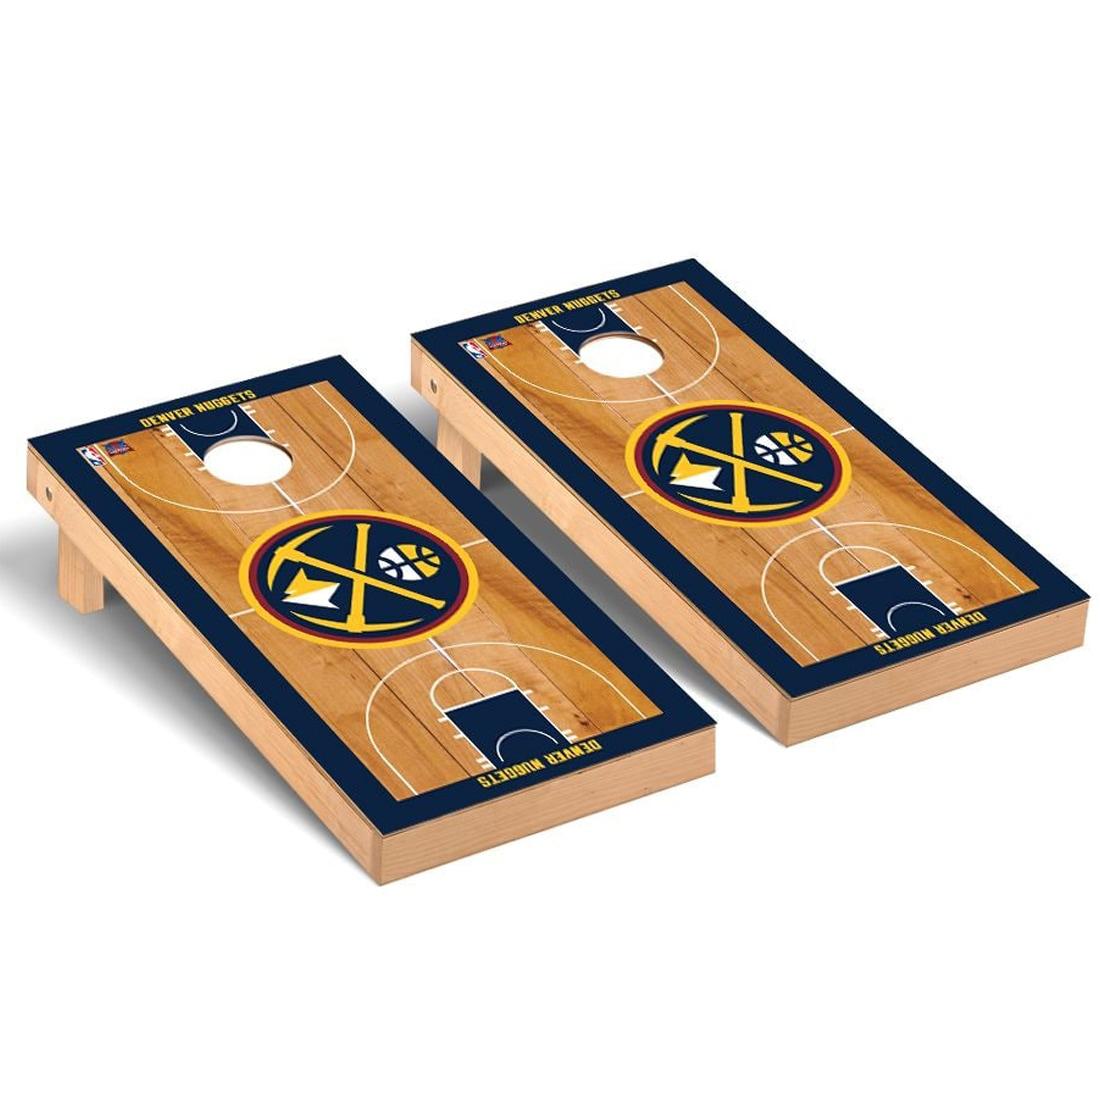 Denver Nuggets 2' x 4' Court Museum Cornhole Board Tailgate Toss Set